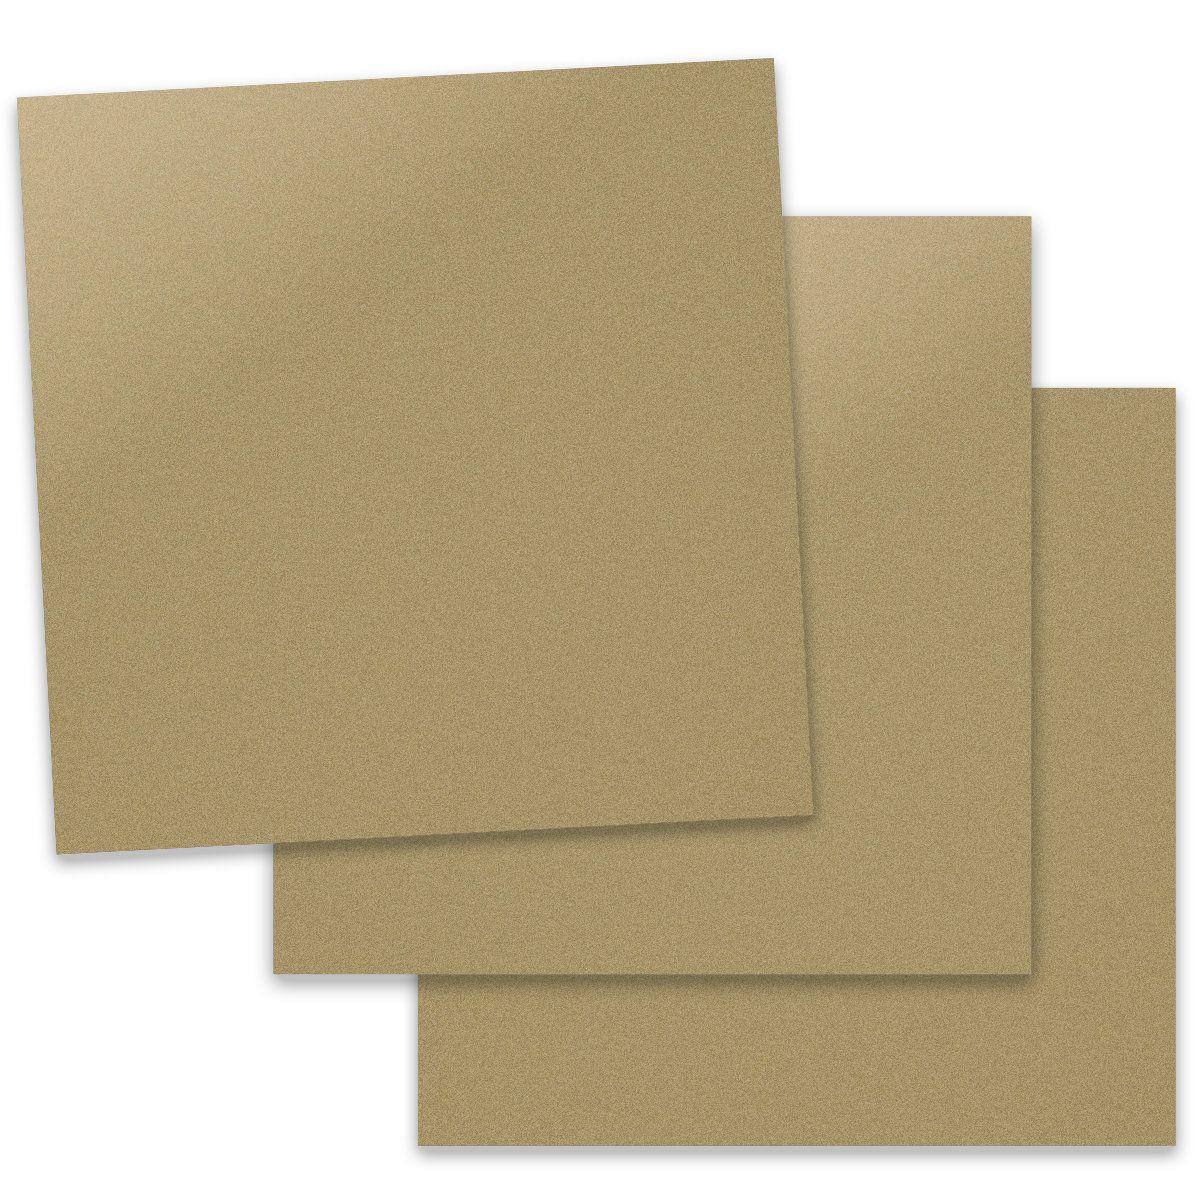 Curious Metallic Gold Leaf 12 X 12 Cardstock Paper 300 Gsm 111lb Cover 50 Pk Metallic Gold Leaf Cardstock Paper Gold Leaf